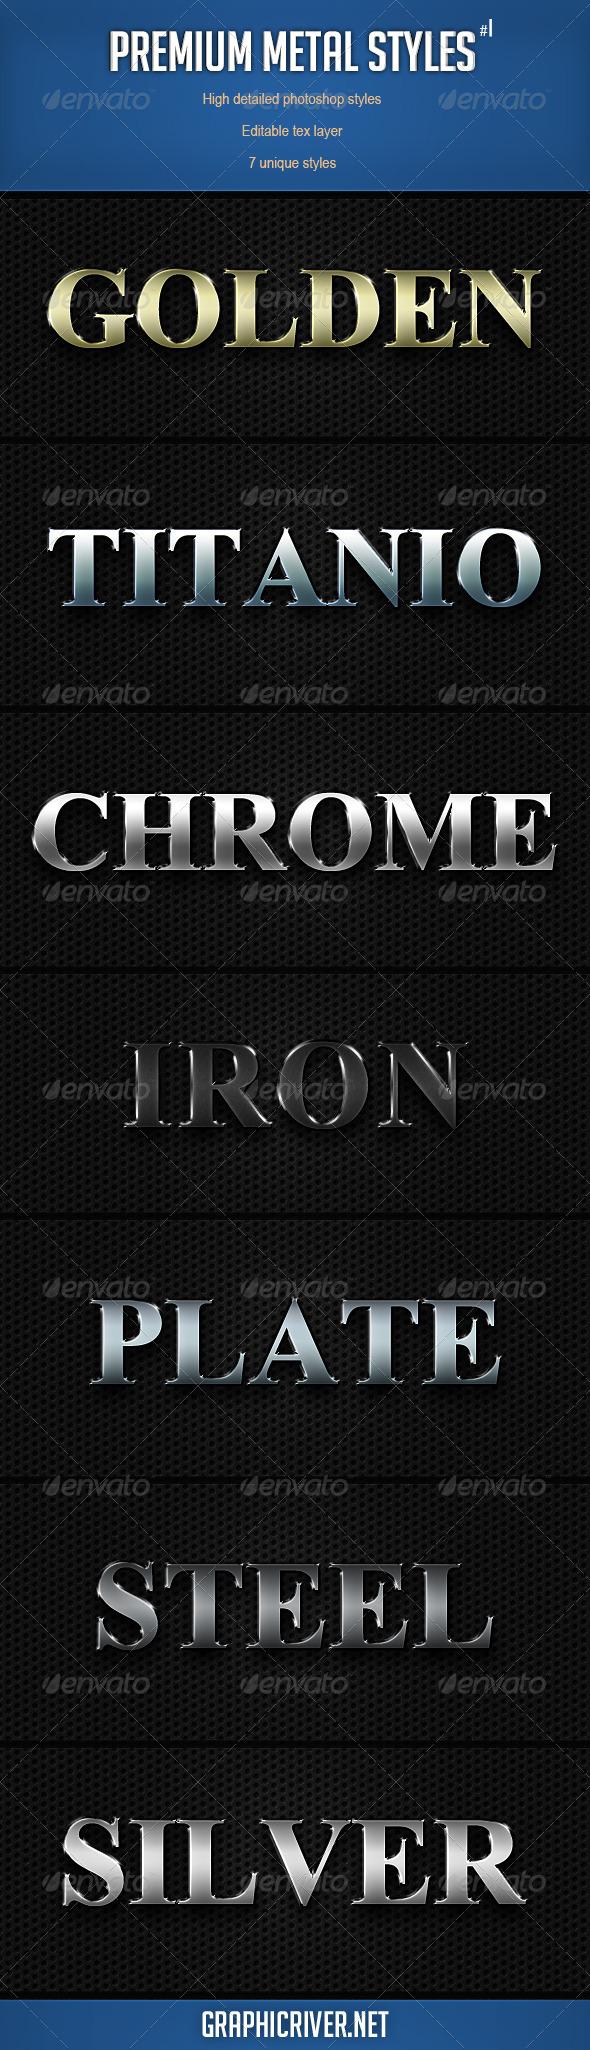 GraphicRiver Premium Metal Styles 2488453